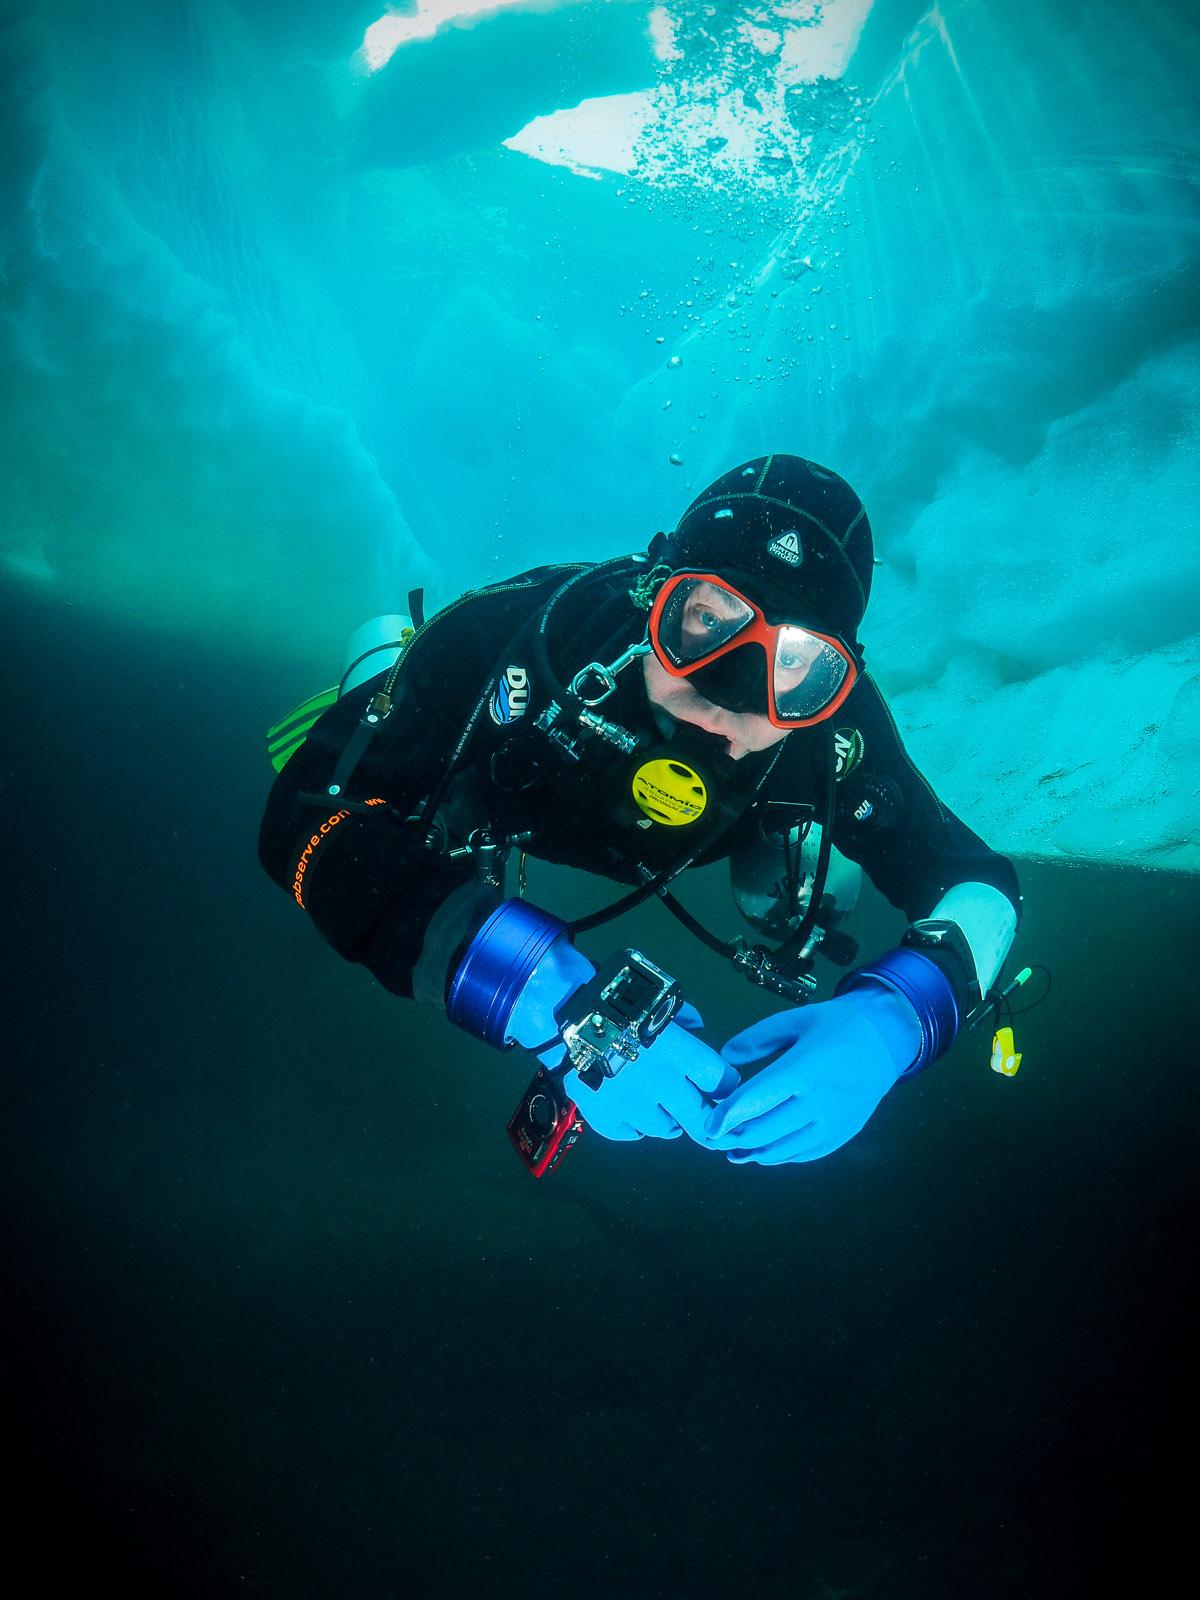 fotografia ekstremalna, fotografia podwodna marcin dobas